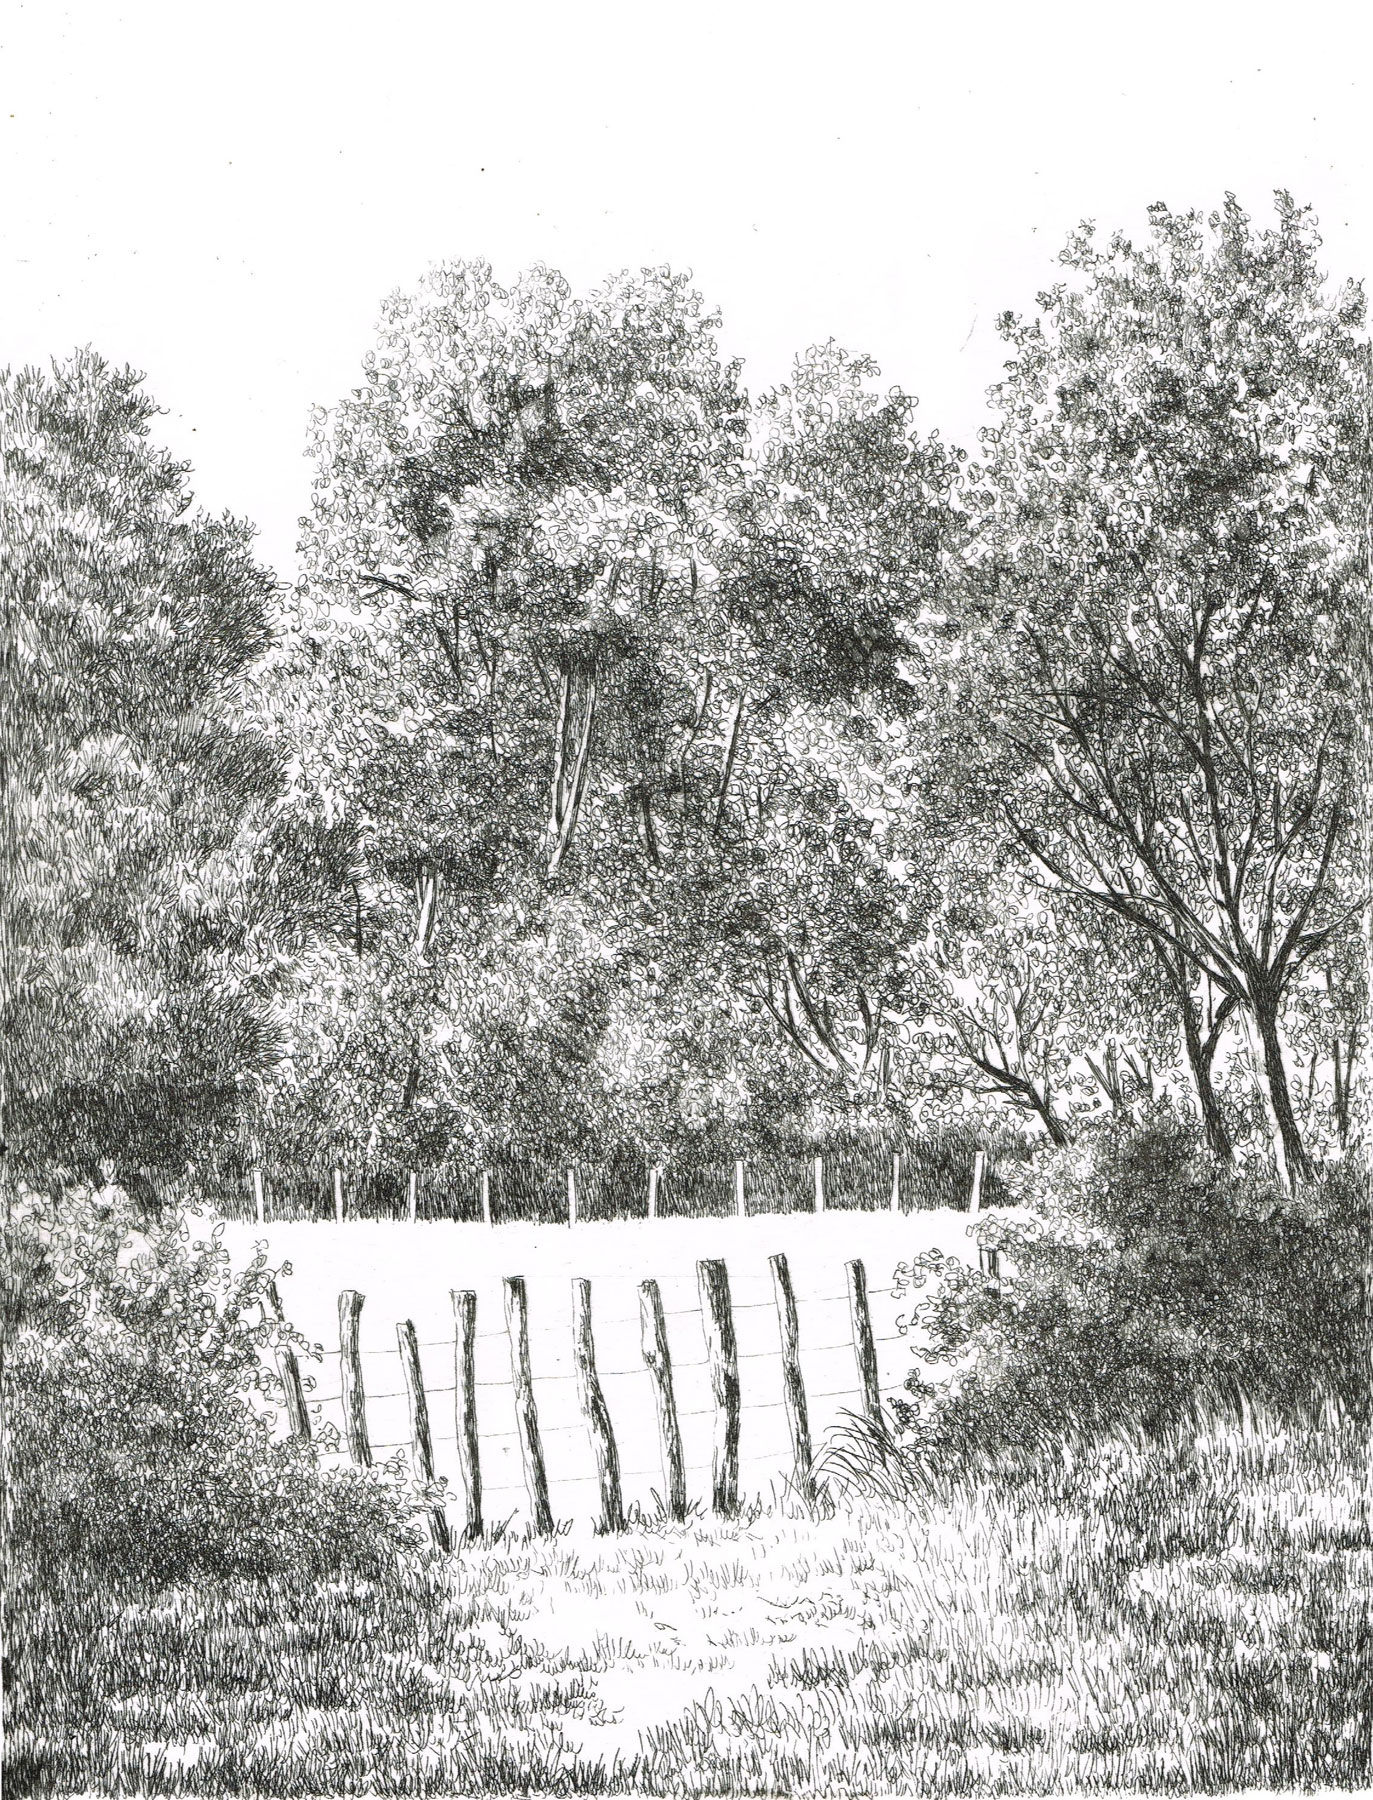 Marais des Huttes